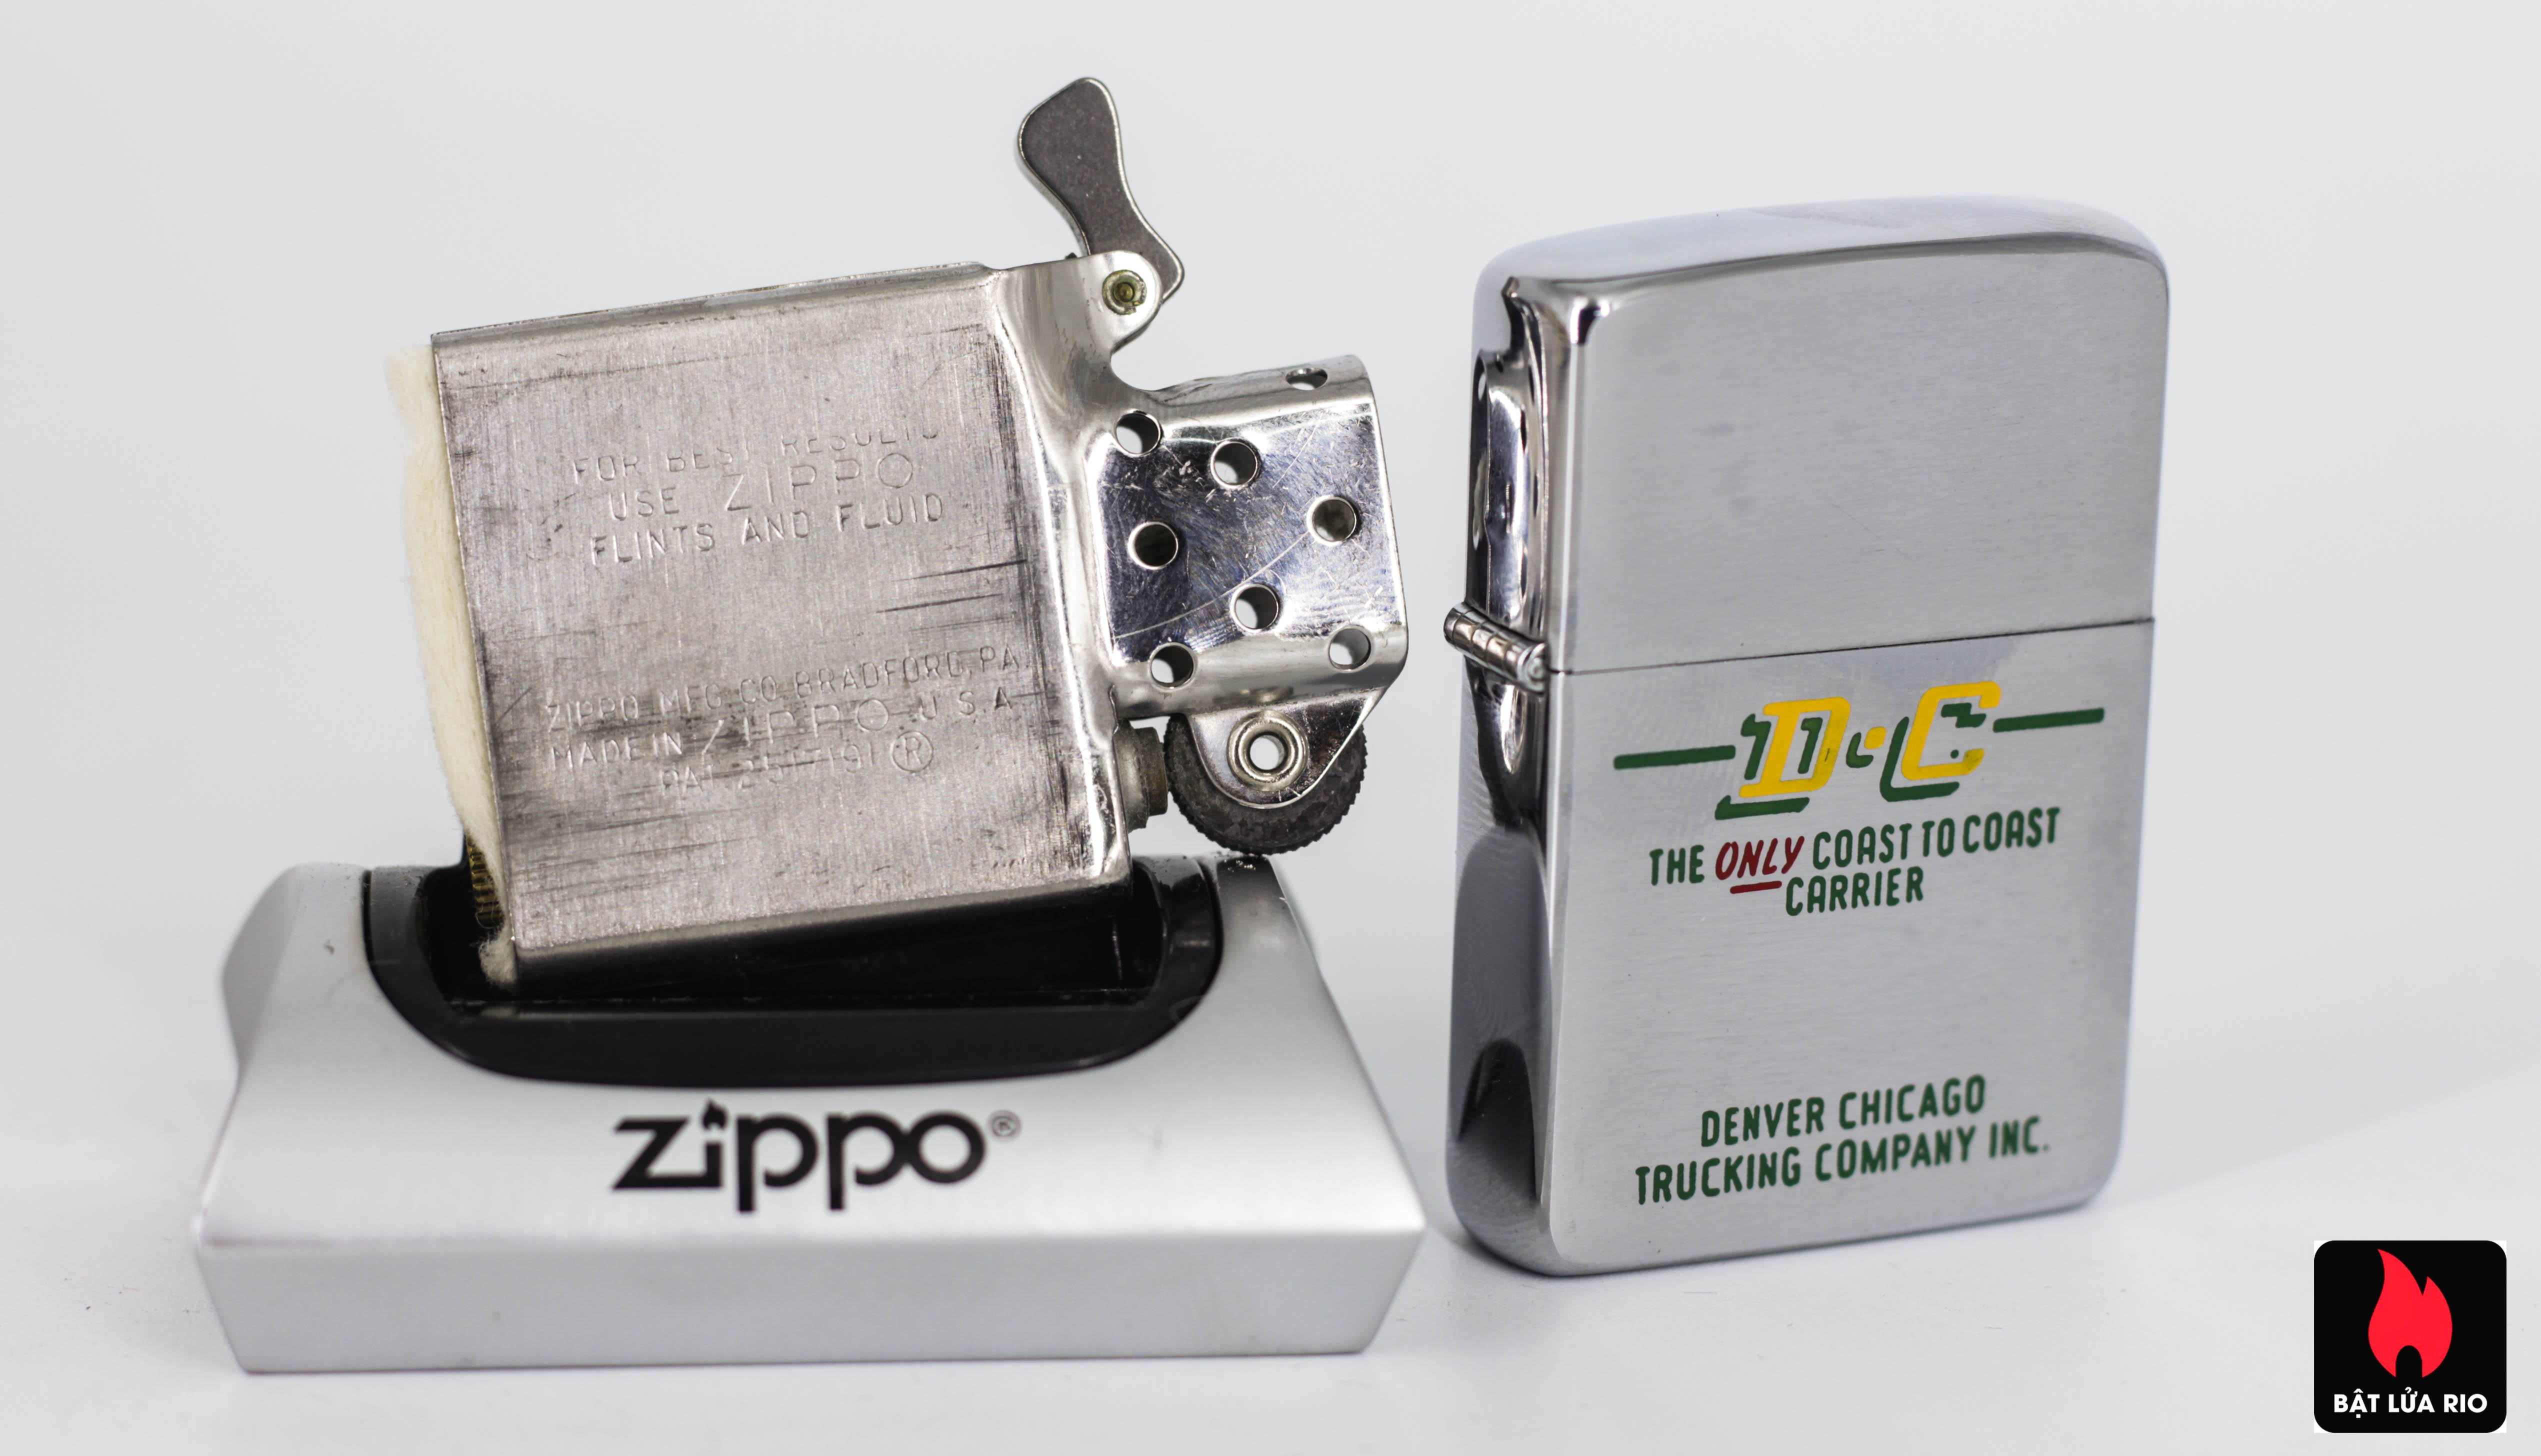 ZIPPO XƯA 1960 - DENVER CHICAGO TRUCKING COMPANY